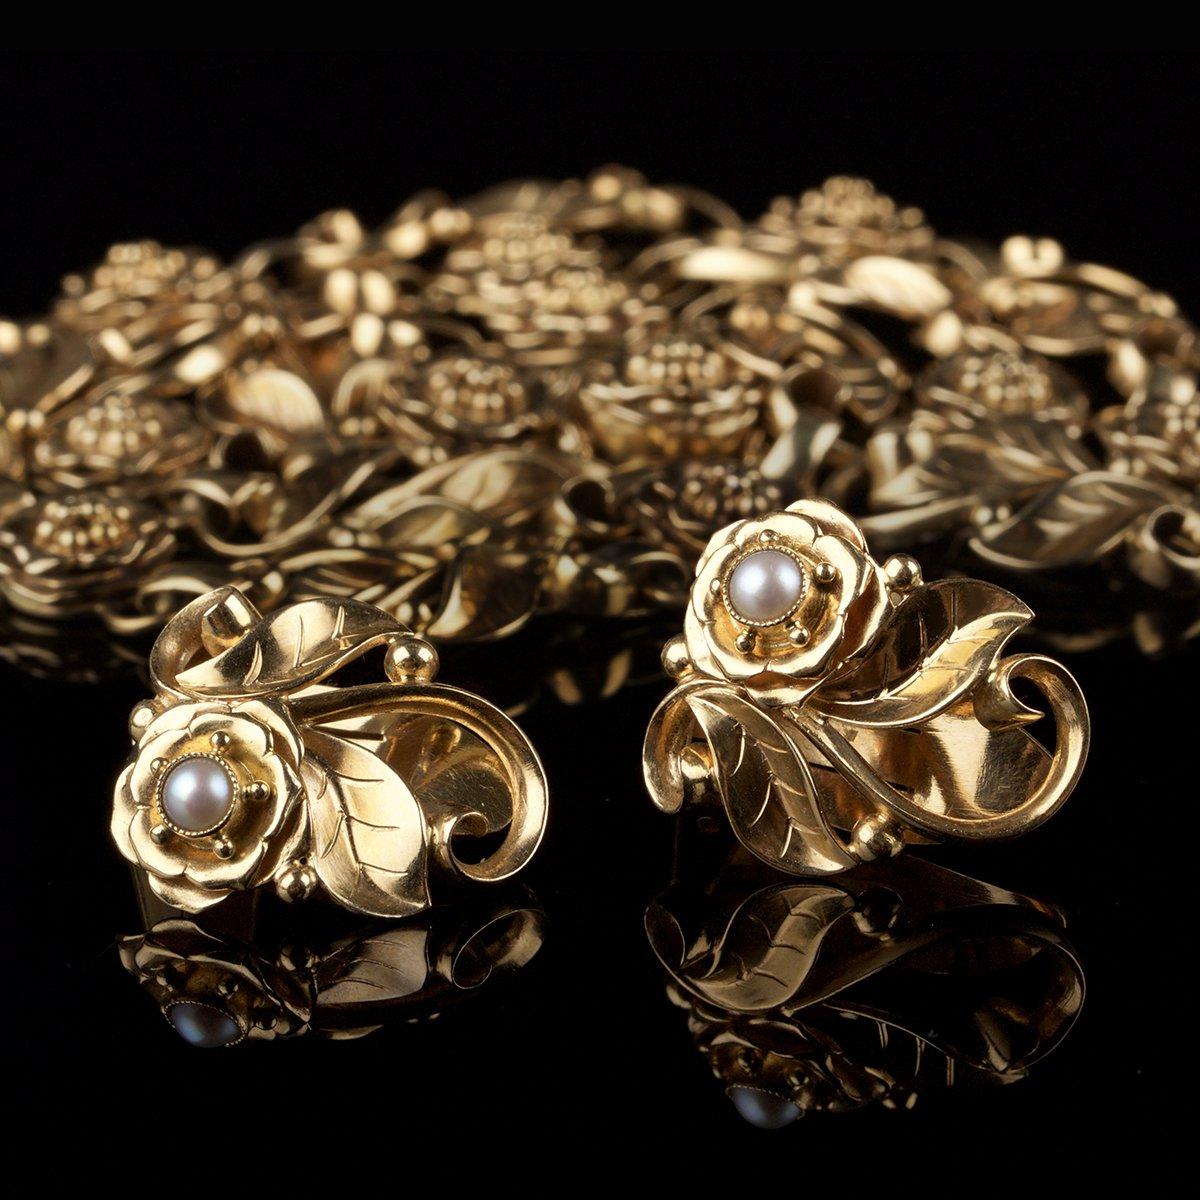 Photo of Georg Jensen pearl jewelry set